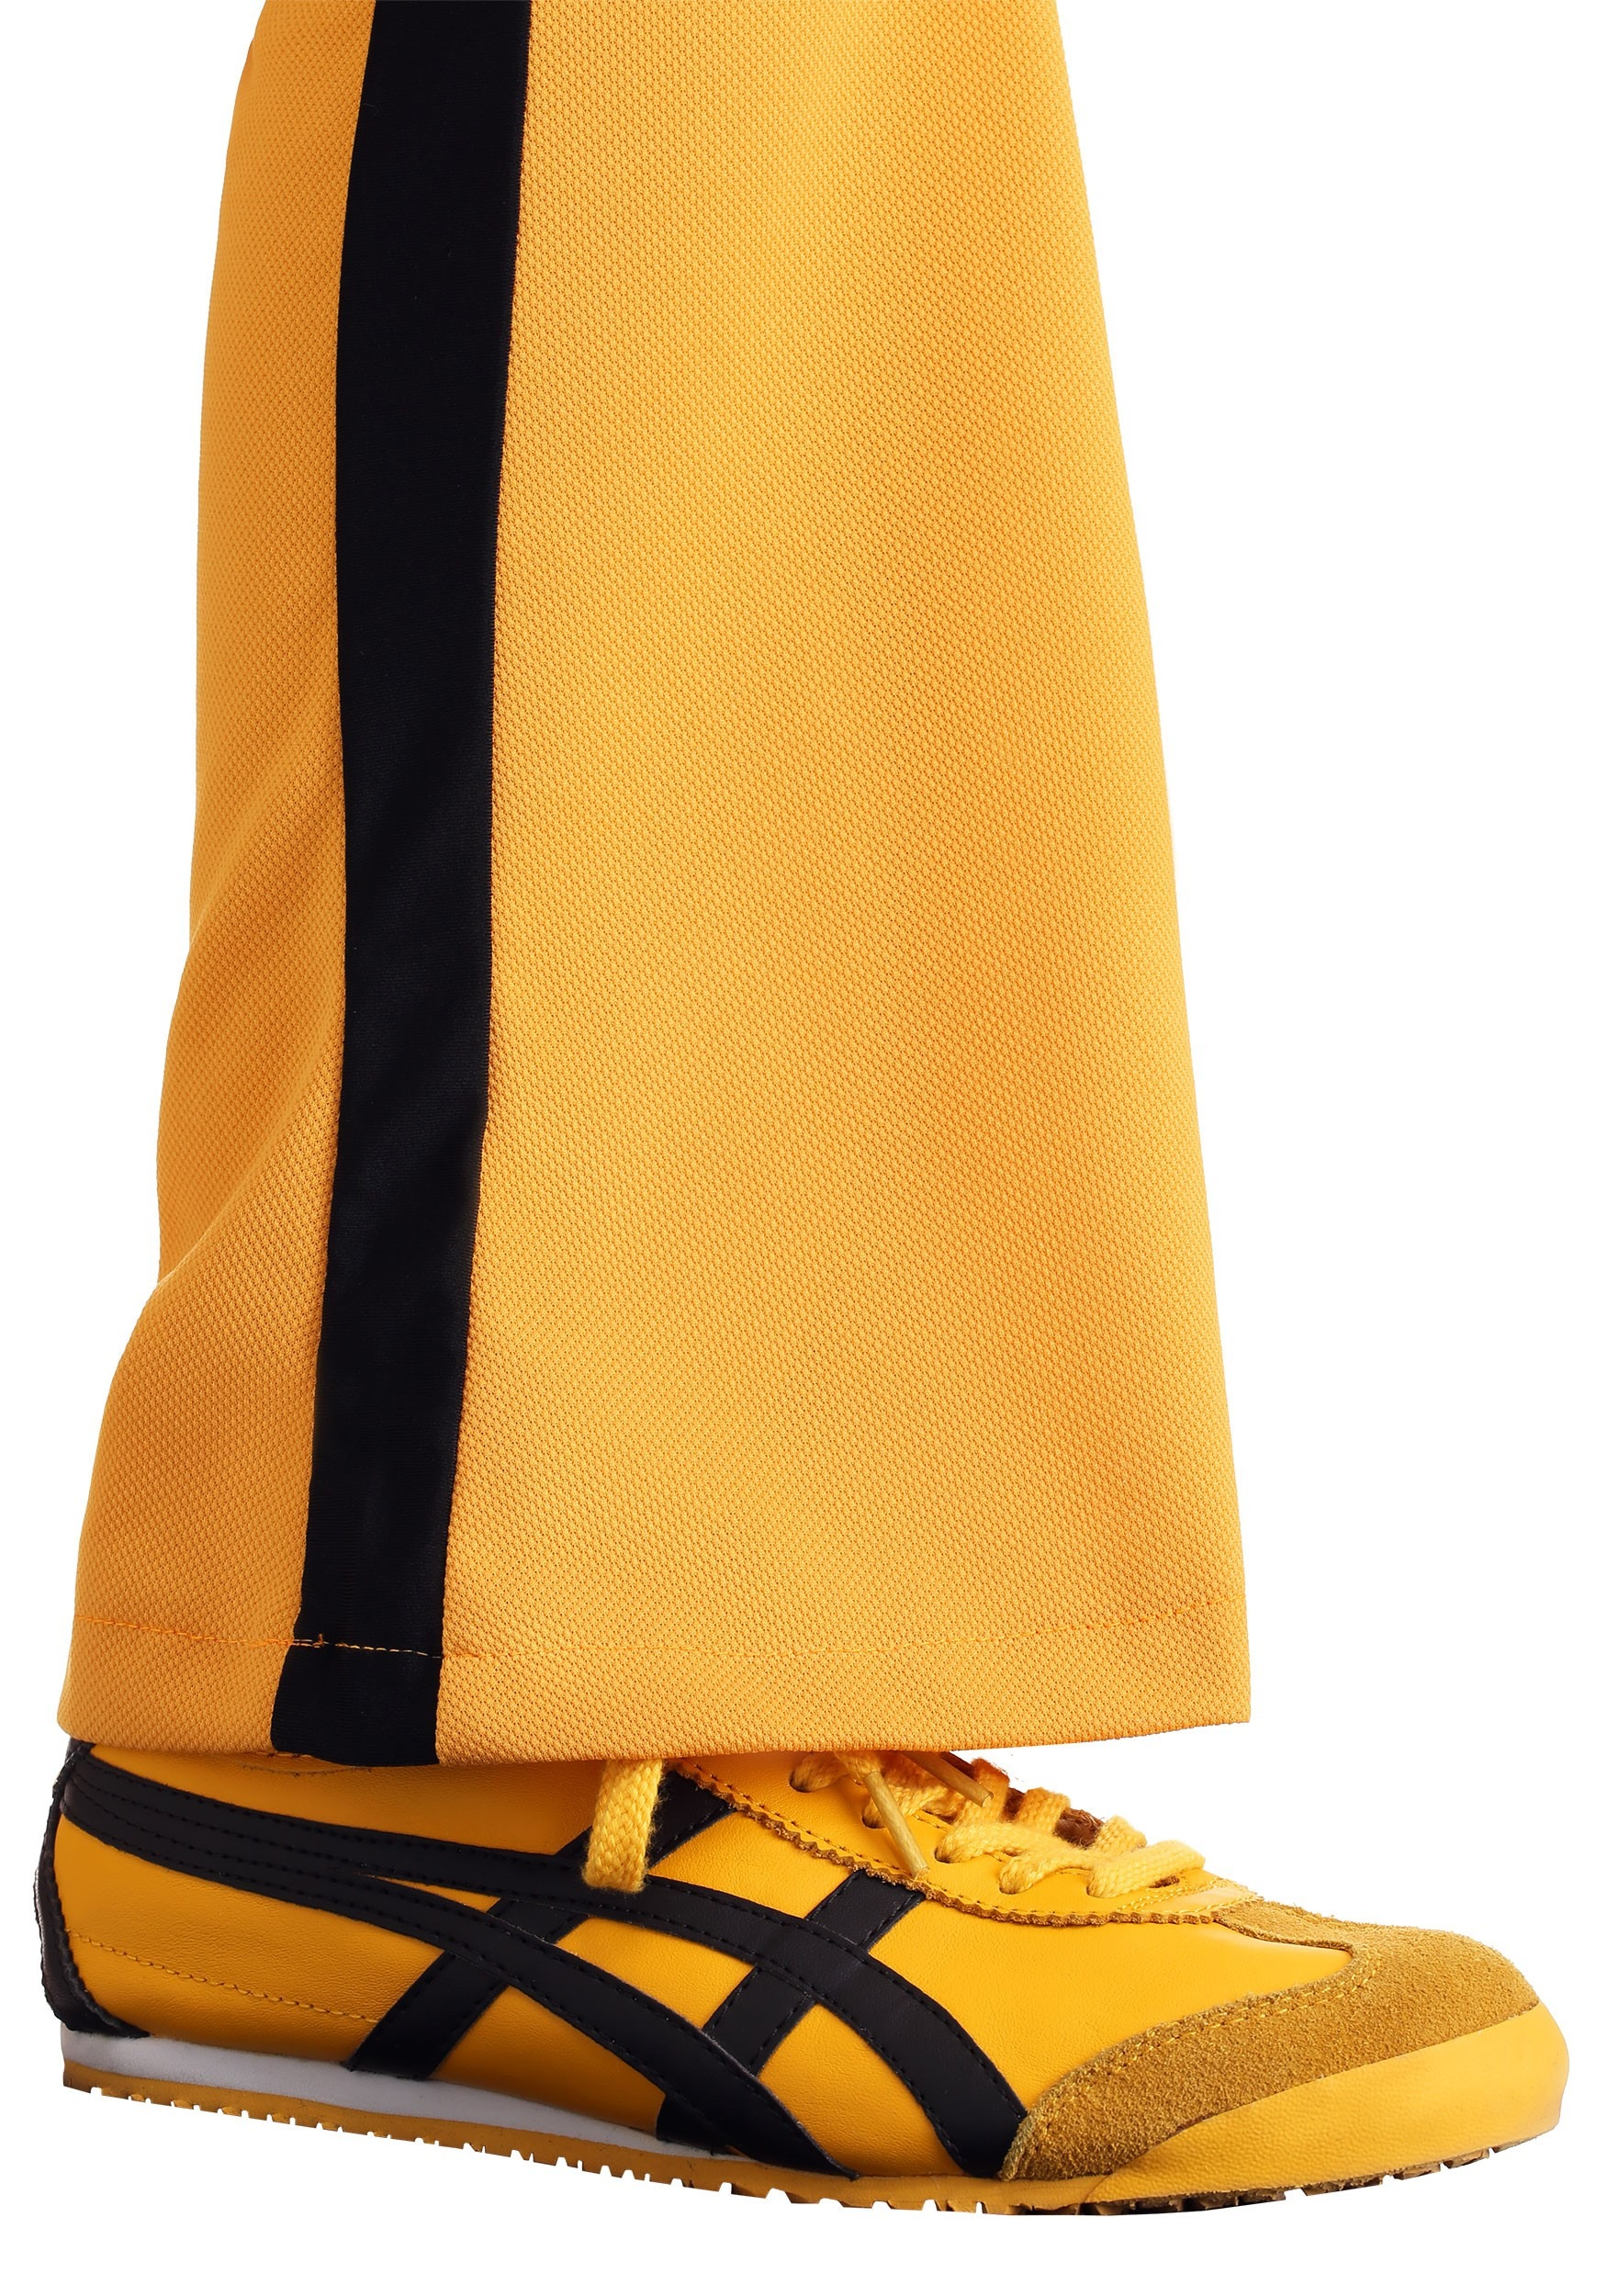 Beatrix Kiddo Costume ...